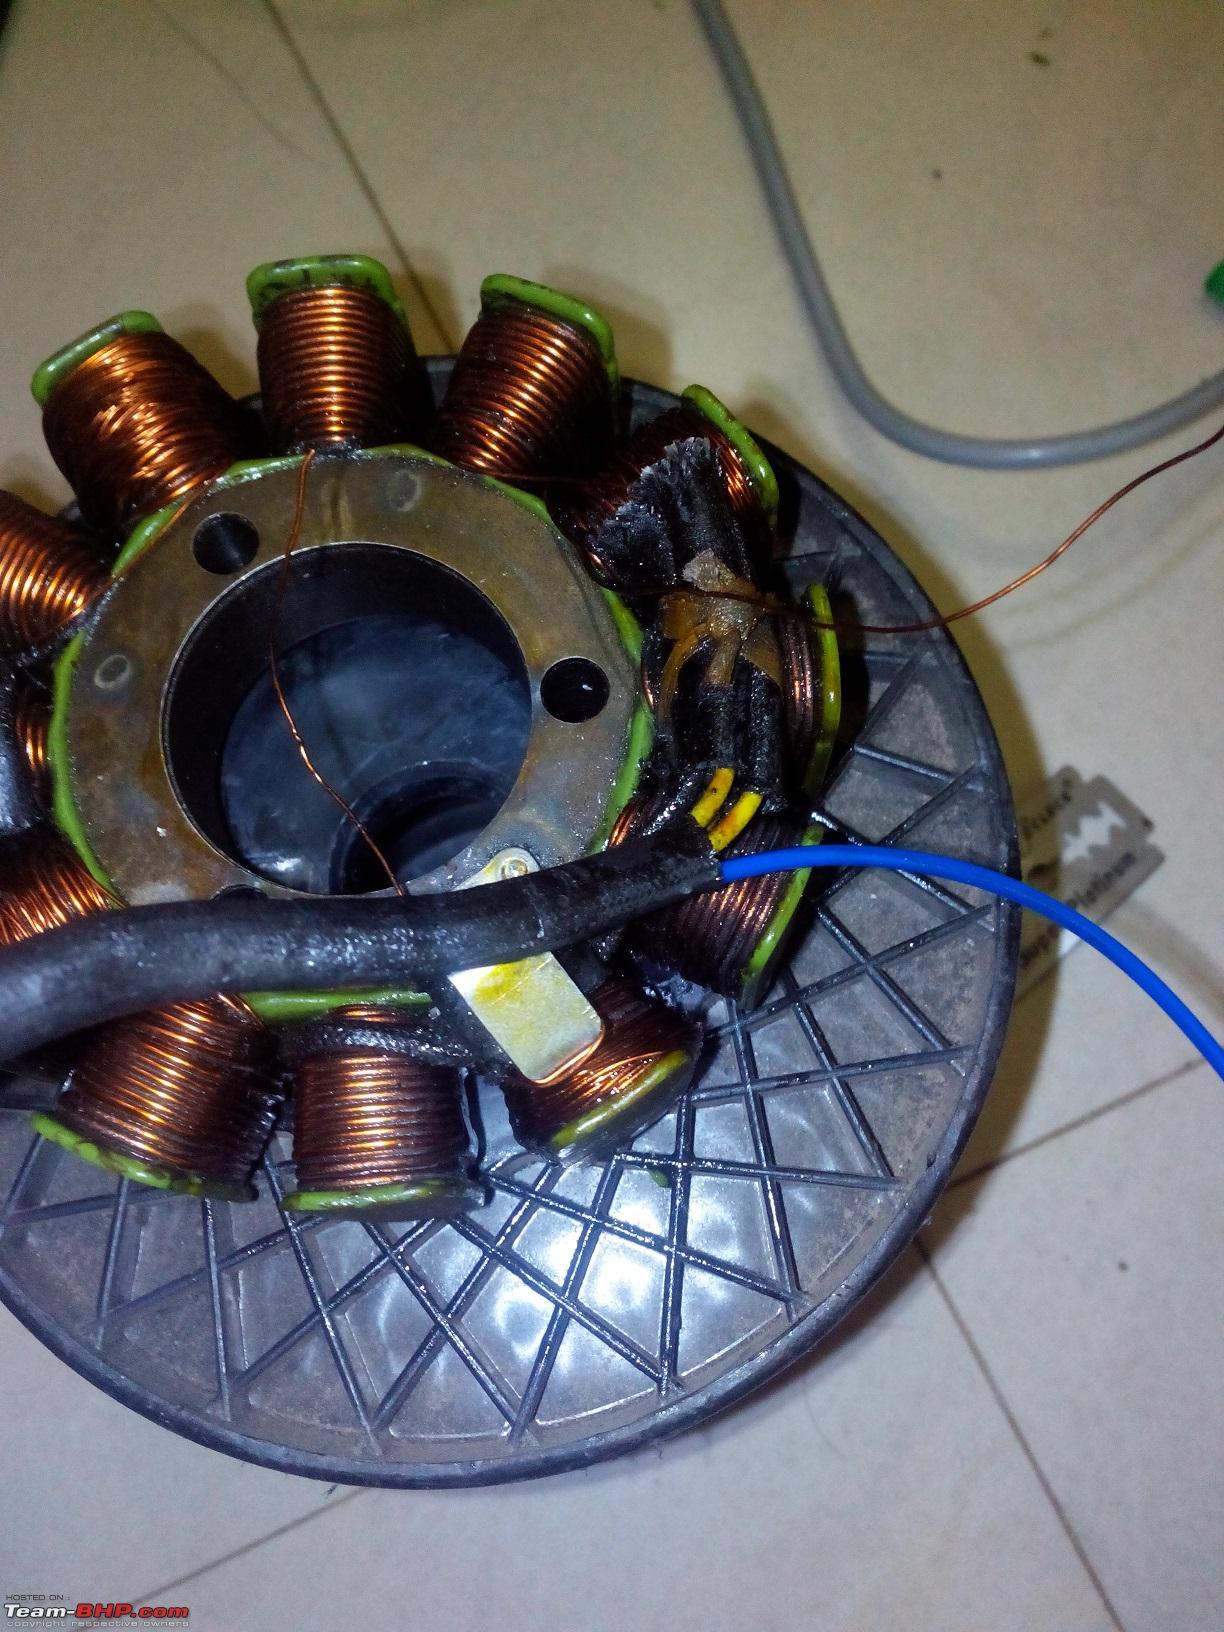 hight resolution of royal enfield 350 electra restoration upgrades img 20140127 223533 jpg